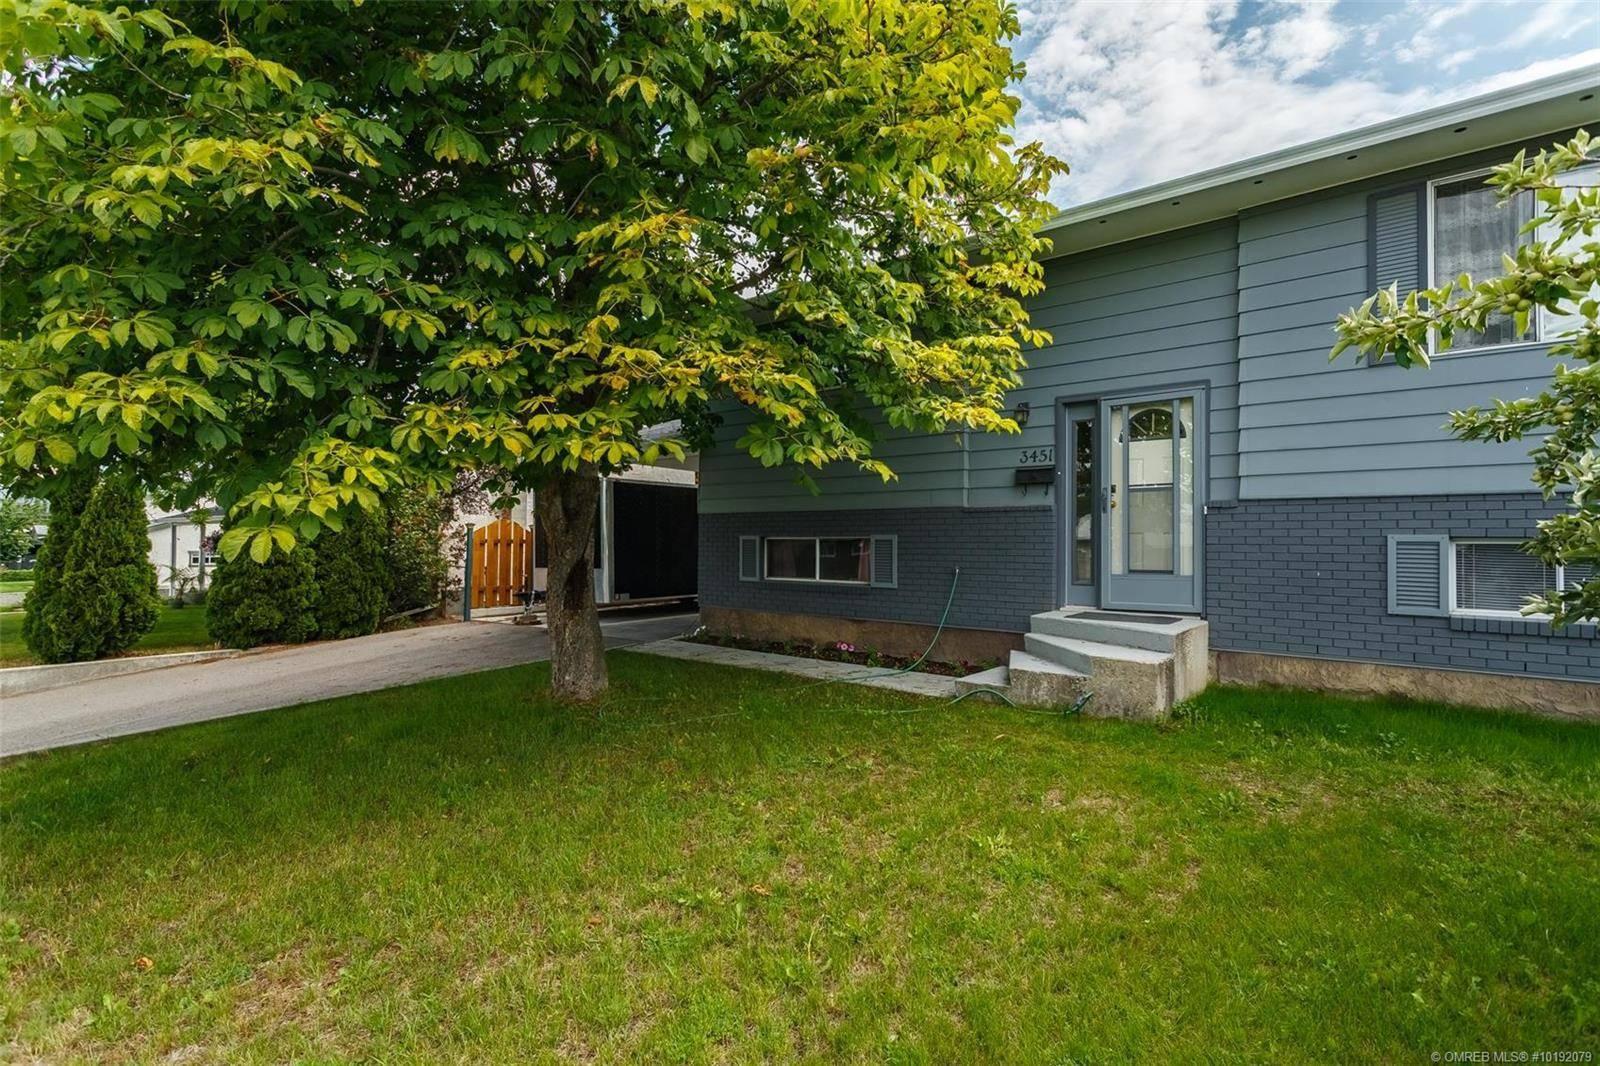 House for sale at 3451 Seratoga Rd Kelowna British Columbia - MLS: 10192079